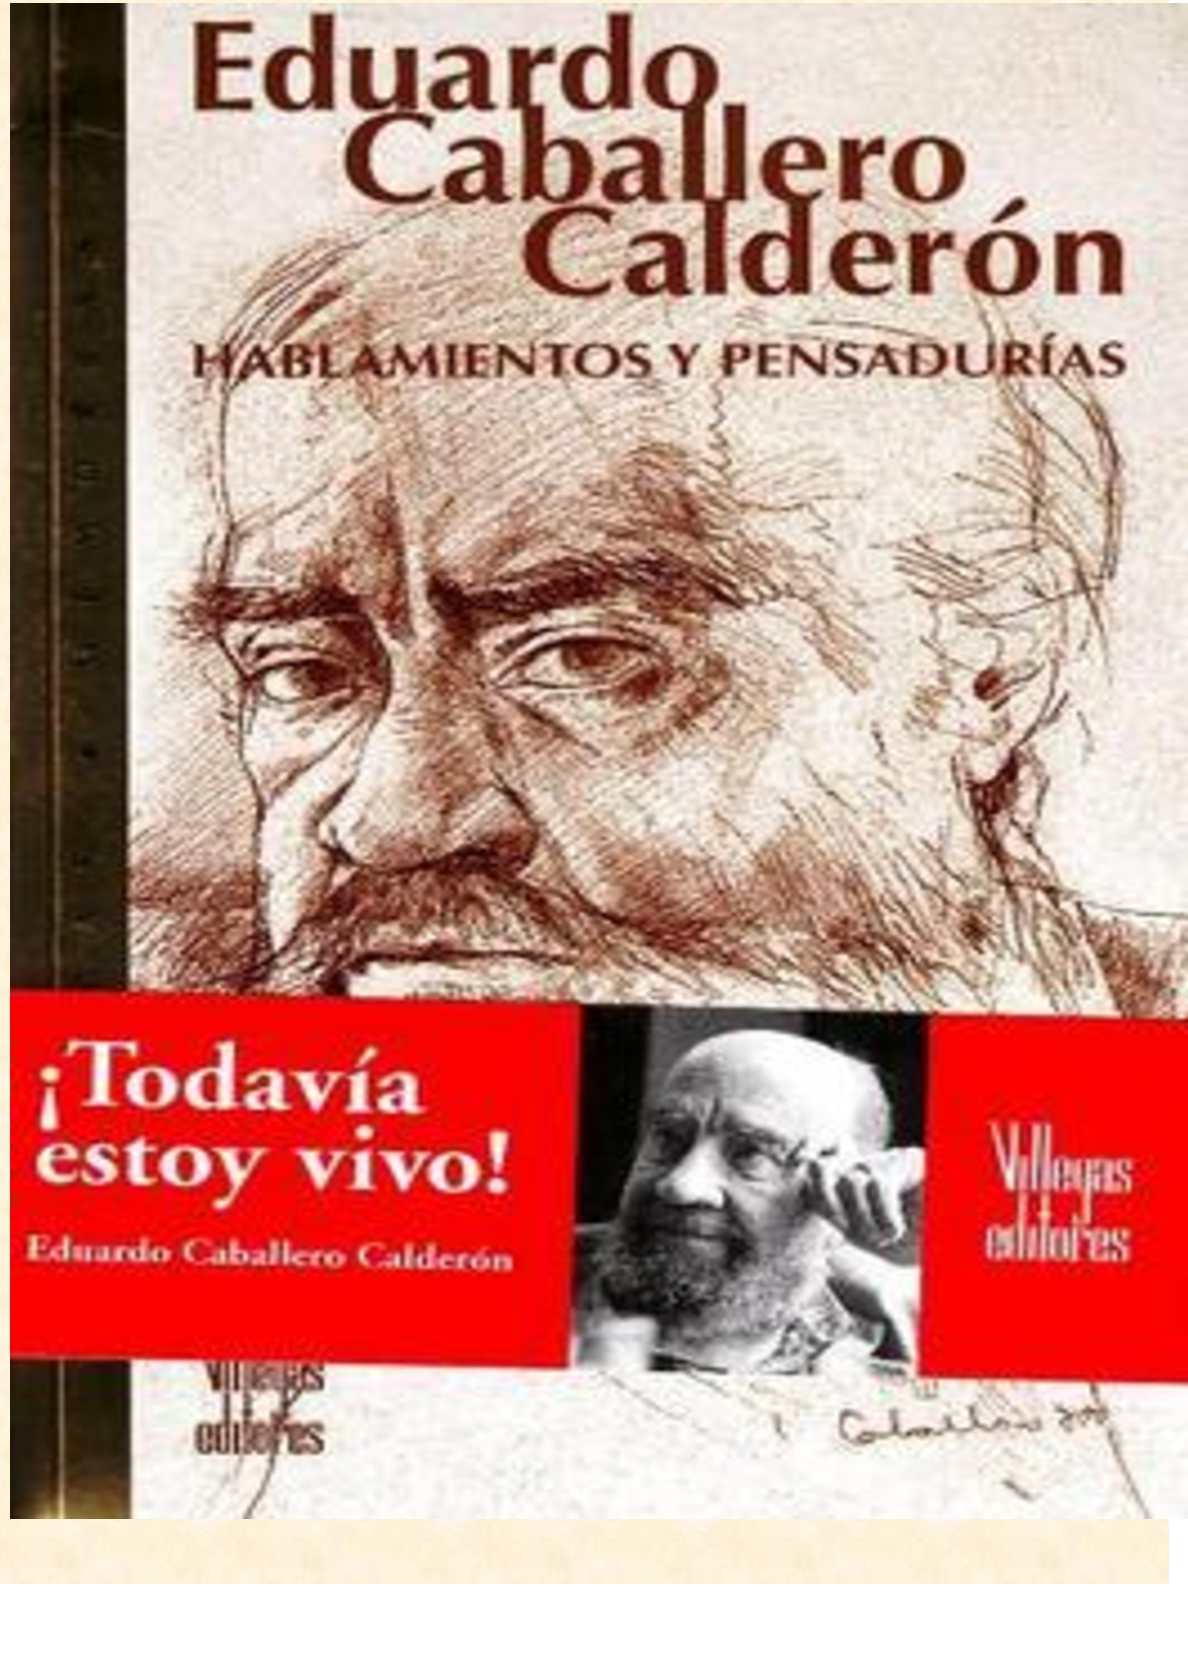 Calaméo - Libro: Hablamientos y pensadurias - Eduardo